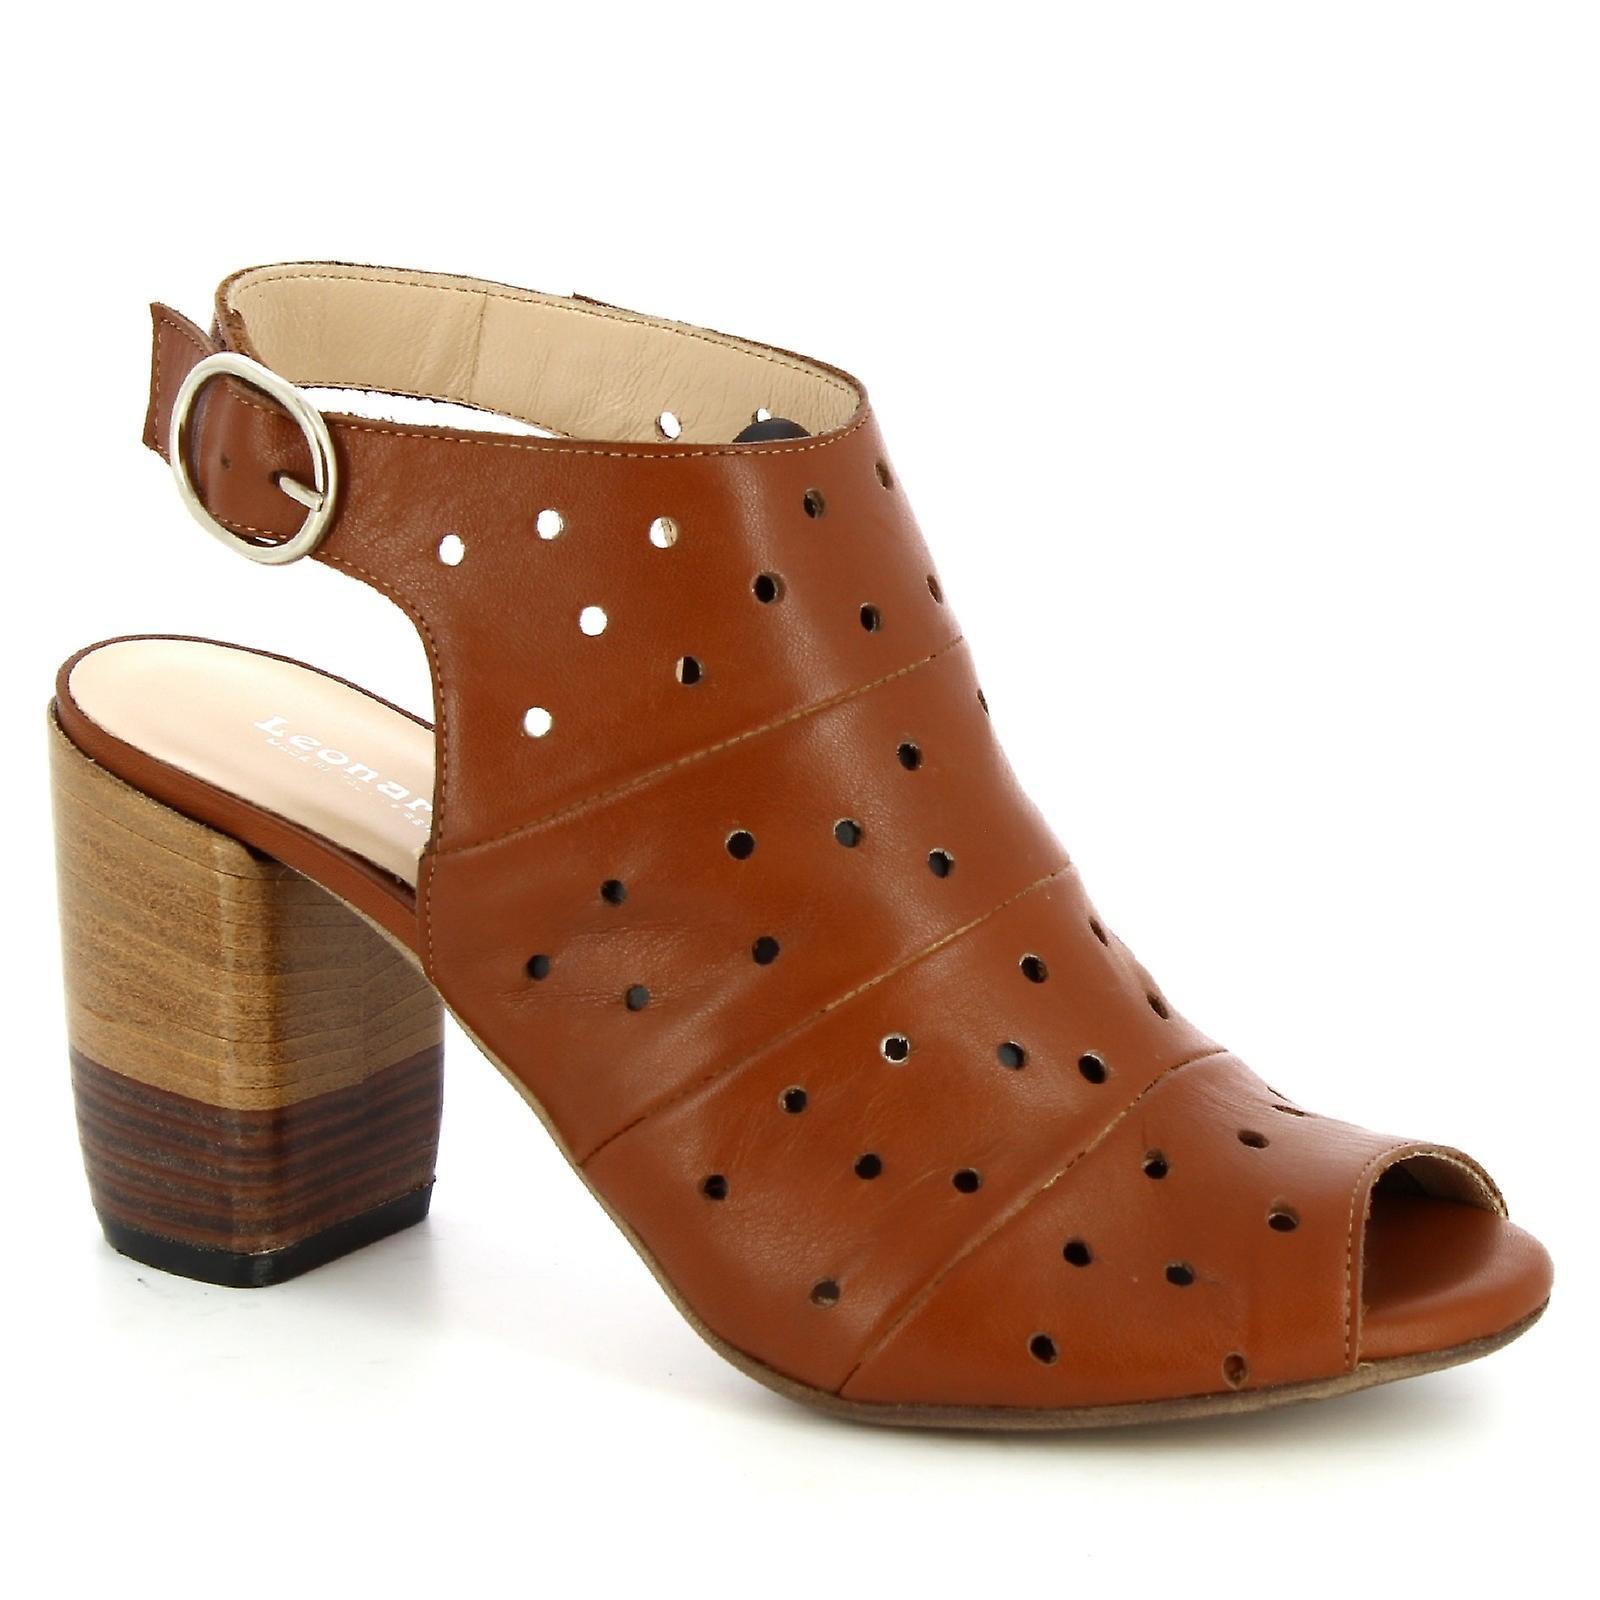 Leonardo Shoes Women's handmade heeled sandals in tan openwork calf leather 3nfux